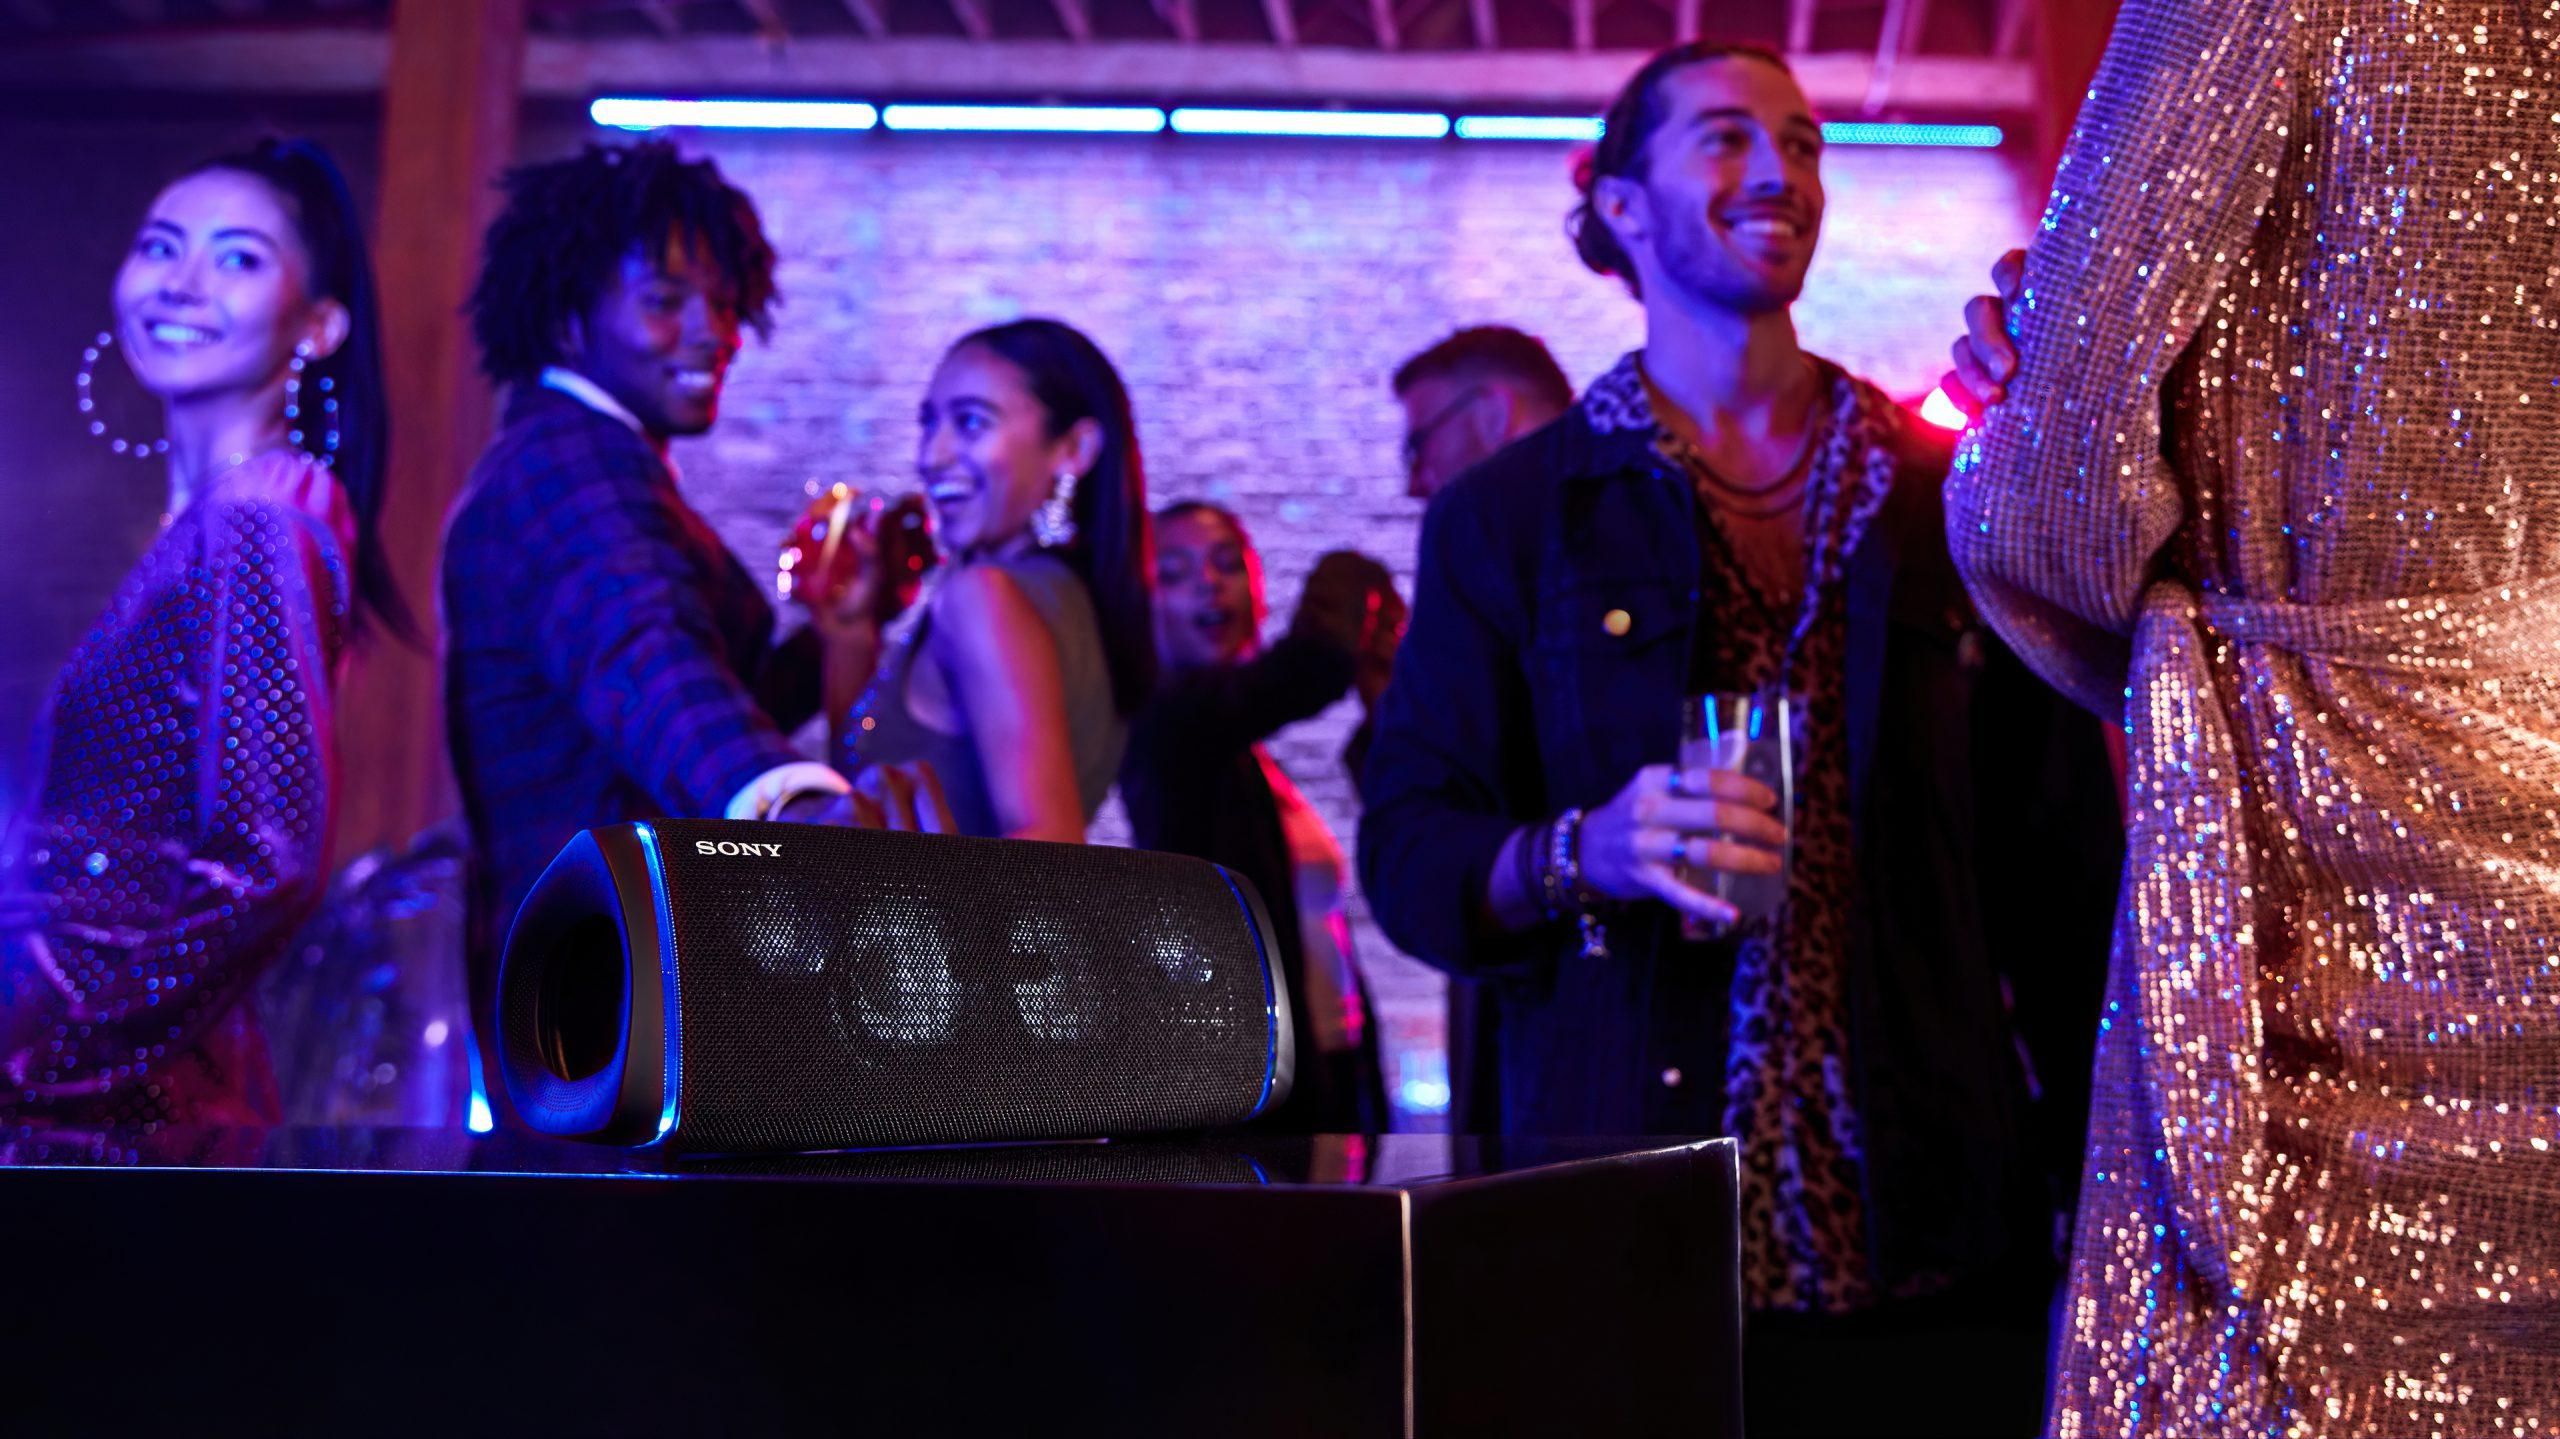 Sony SRS-XB43 lifestyle 2